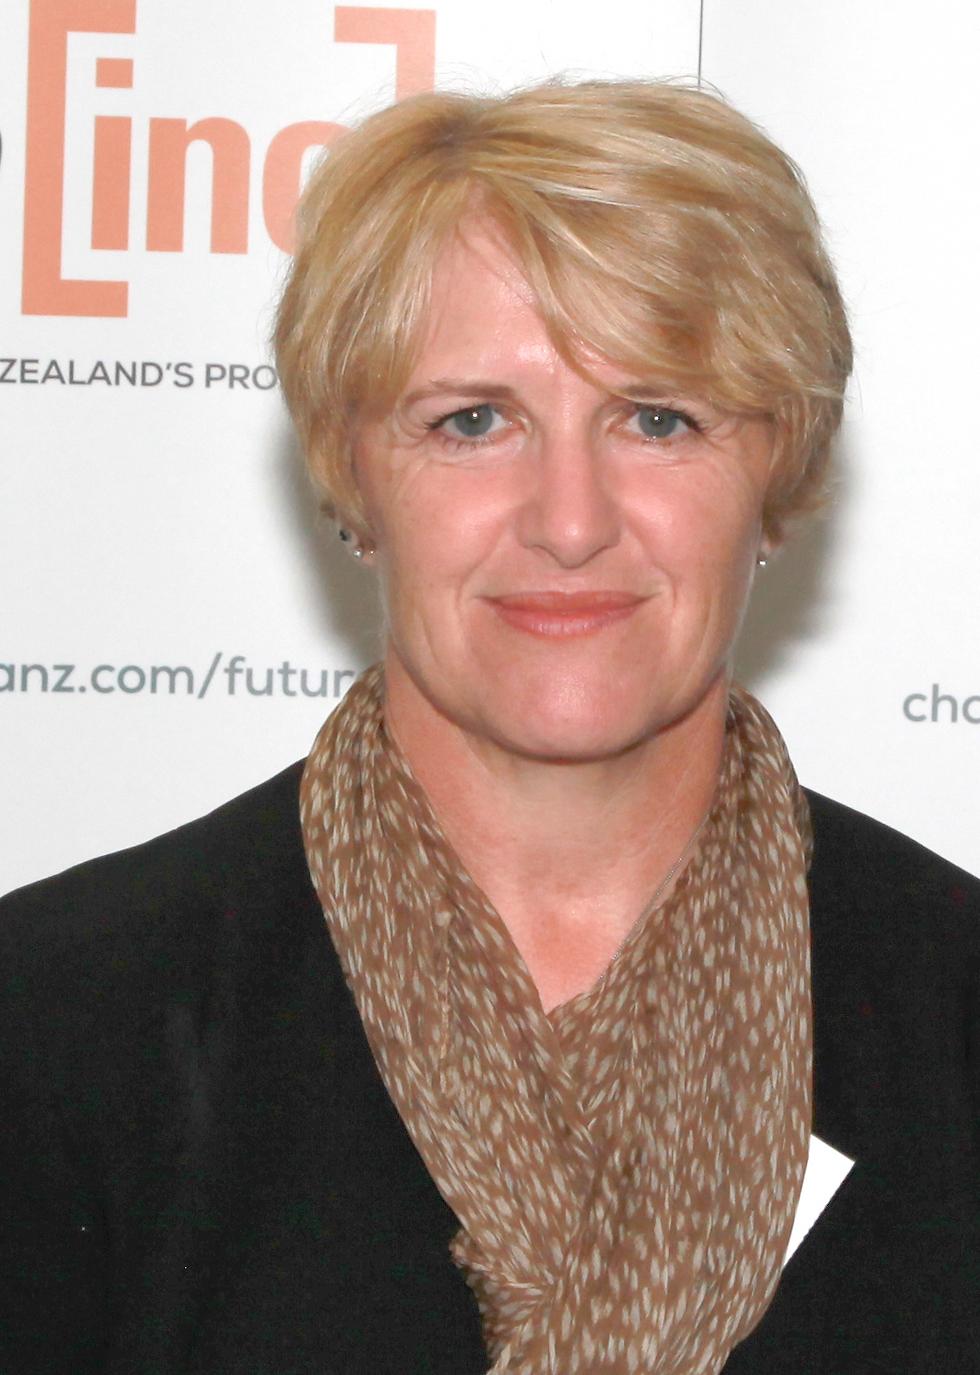 General Manager, Australian Regions, Chartered Accountants Australia New Zealand